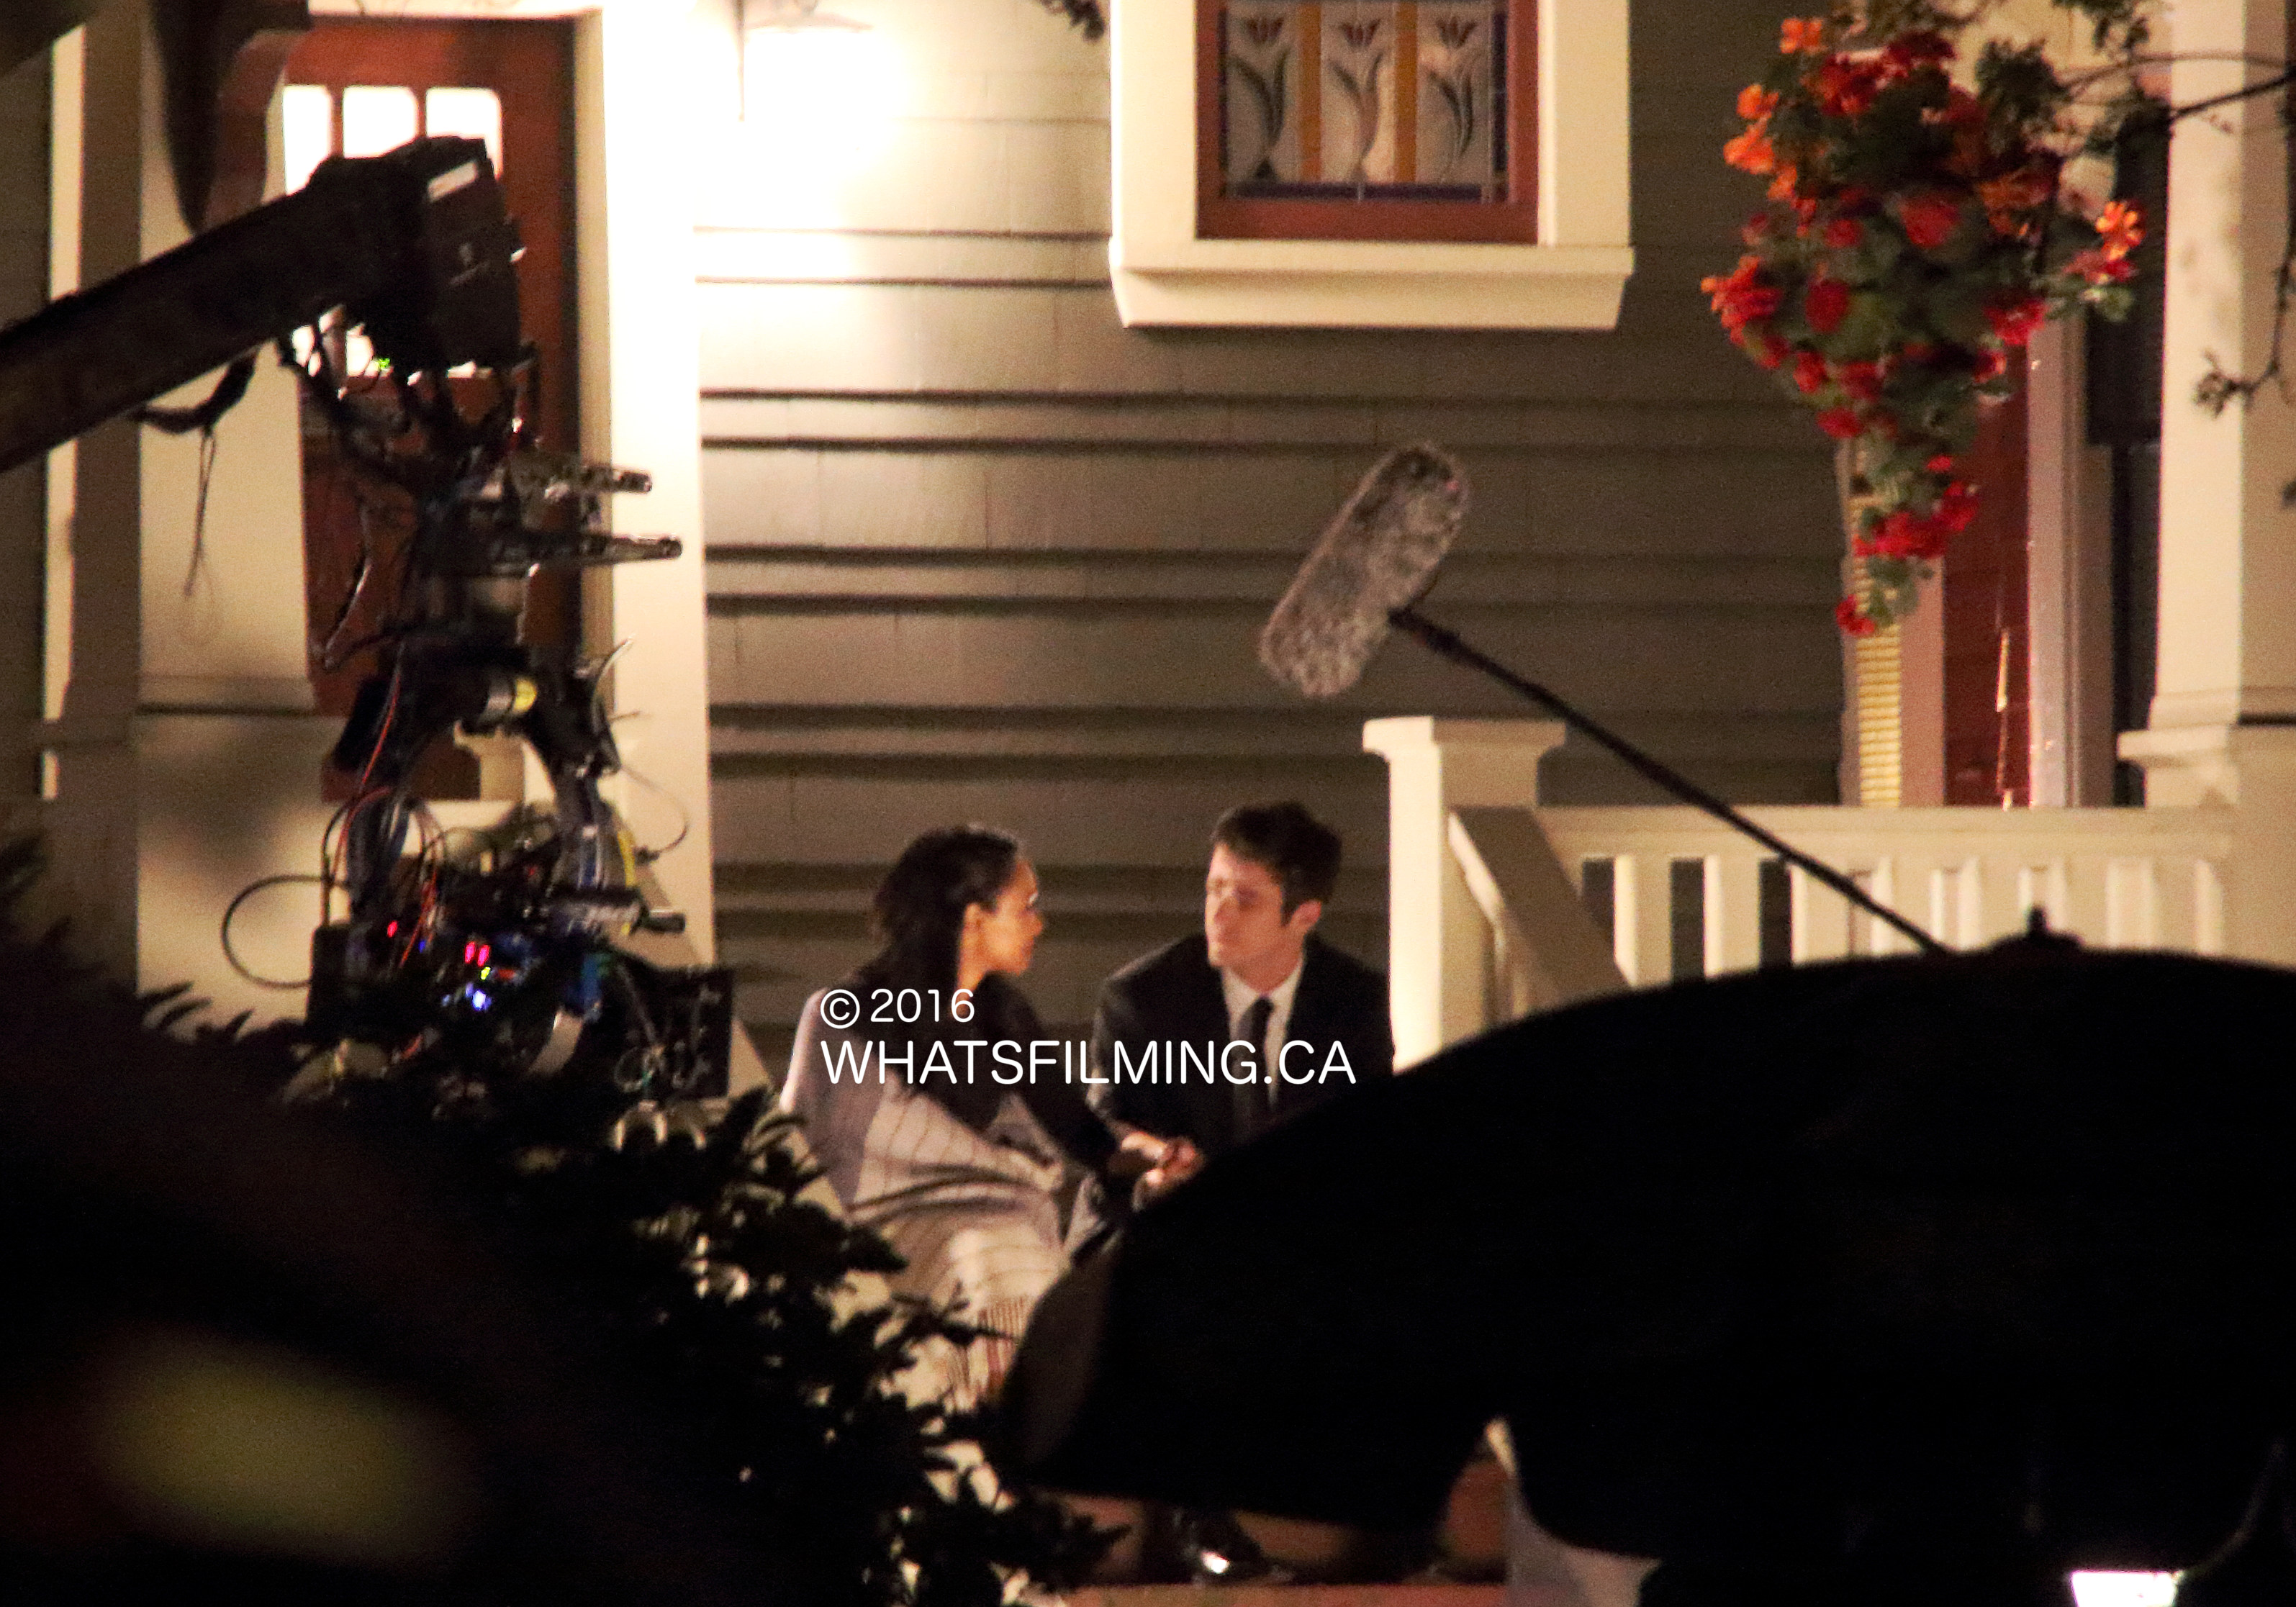 The Flash Season 2 Finale Filming